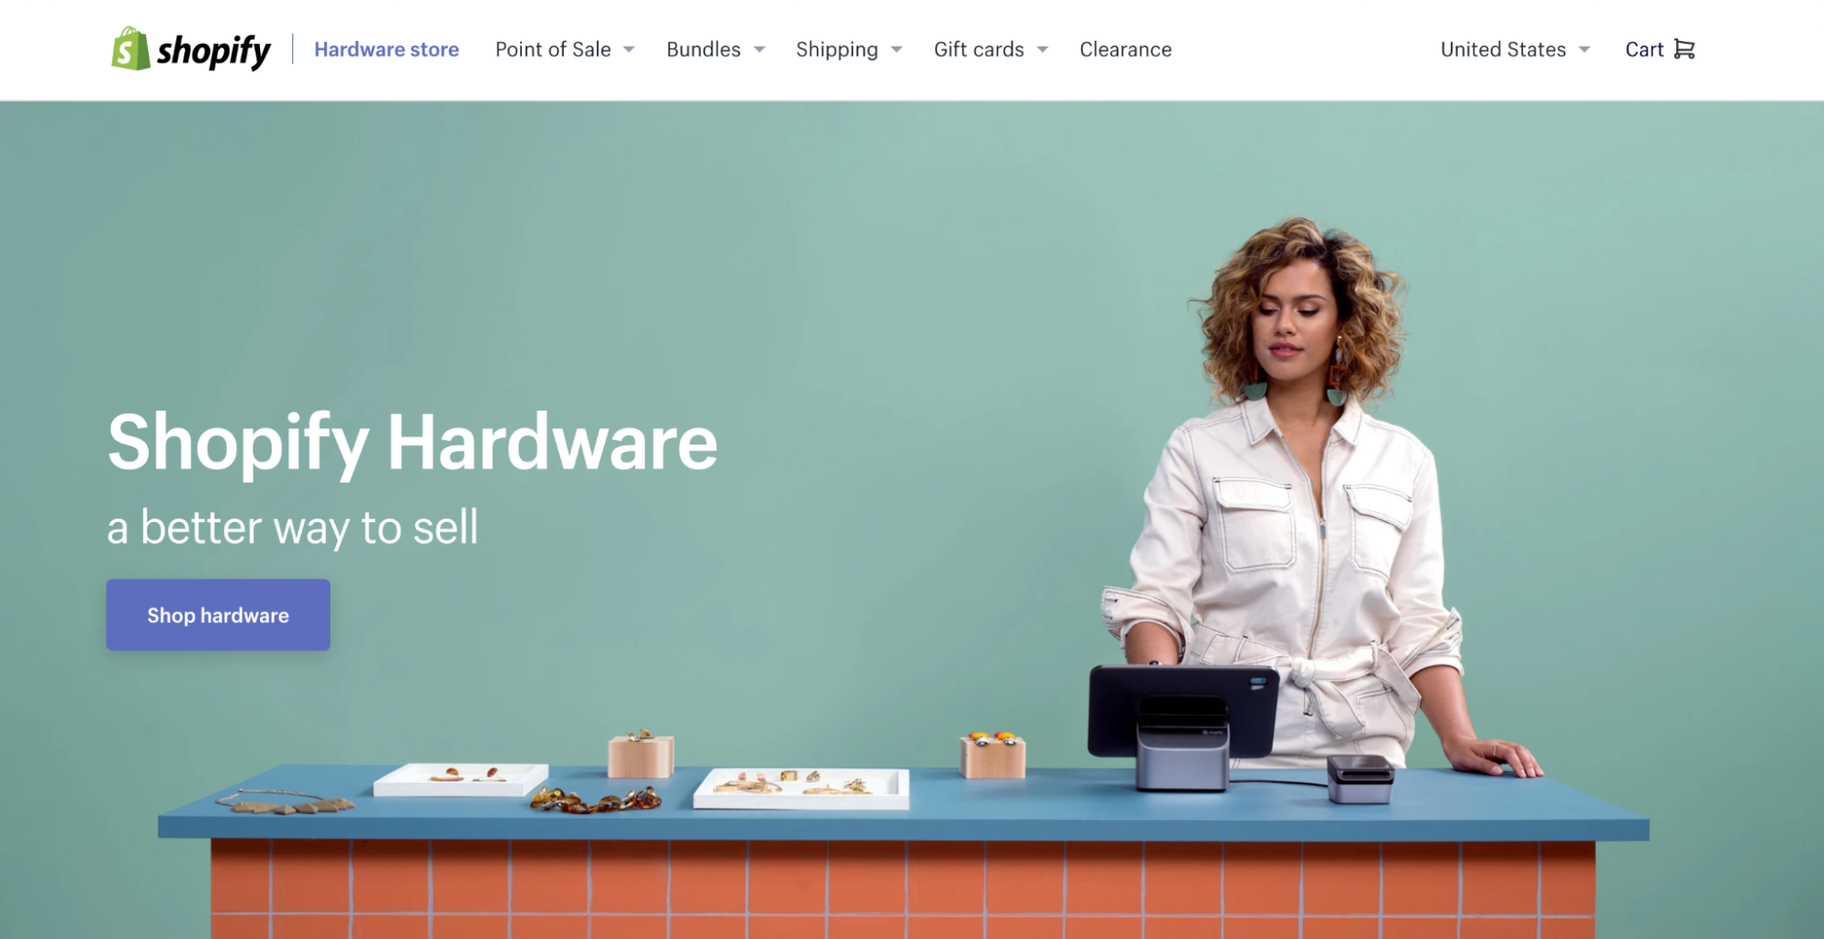 Shopify Hardware